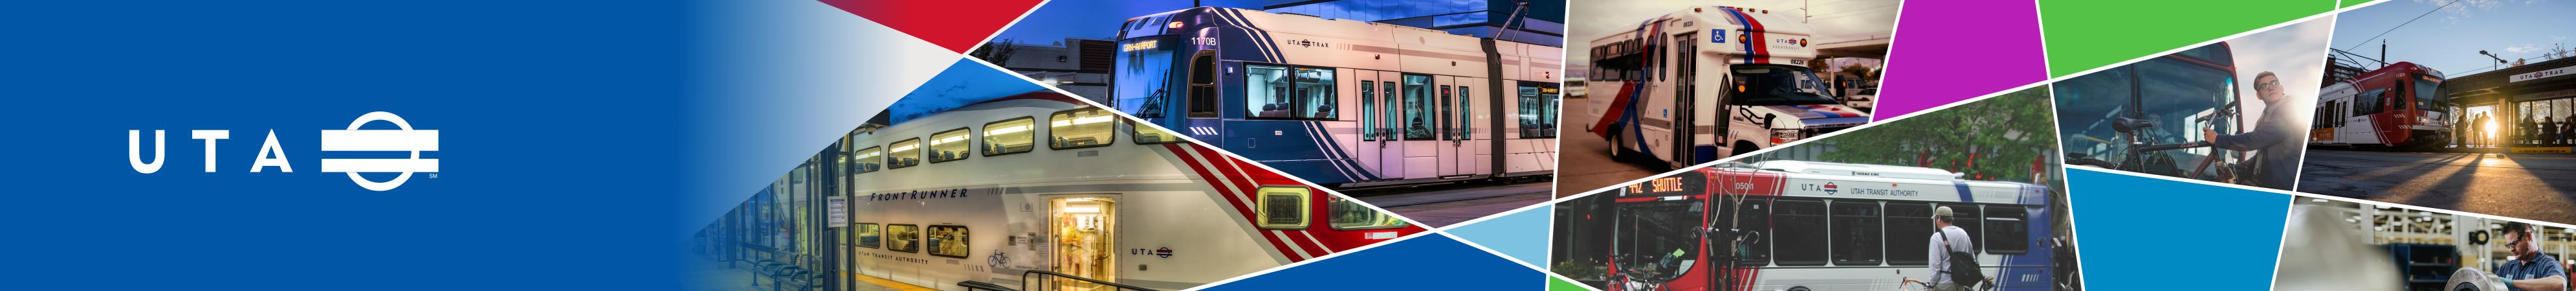 Utah Transit Authority header